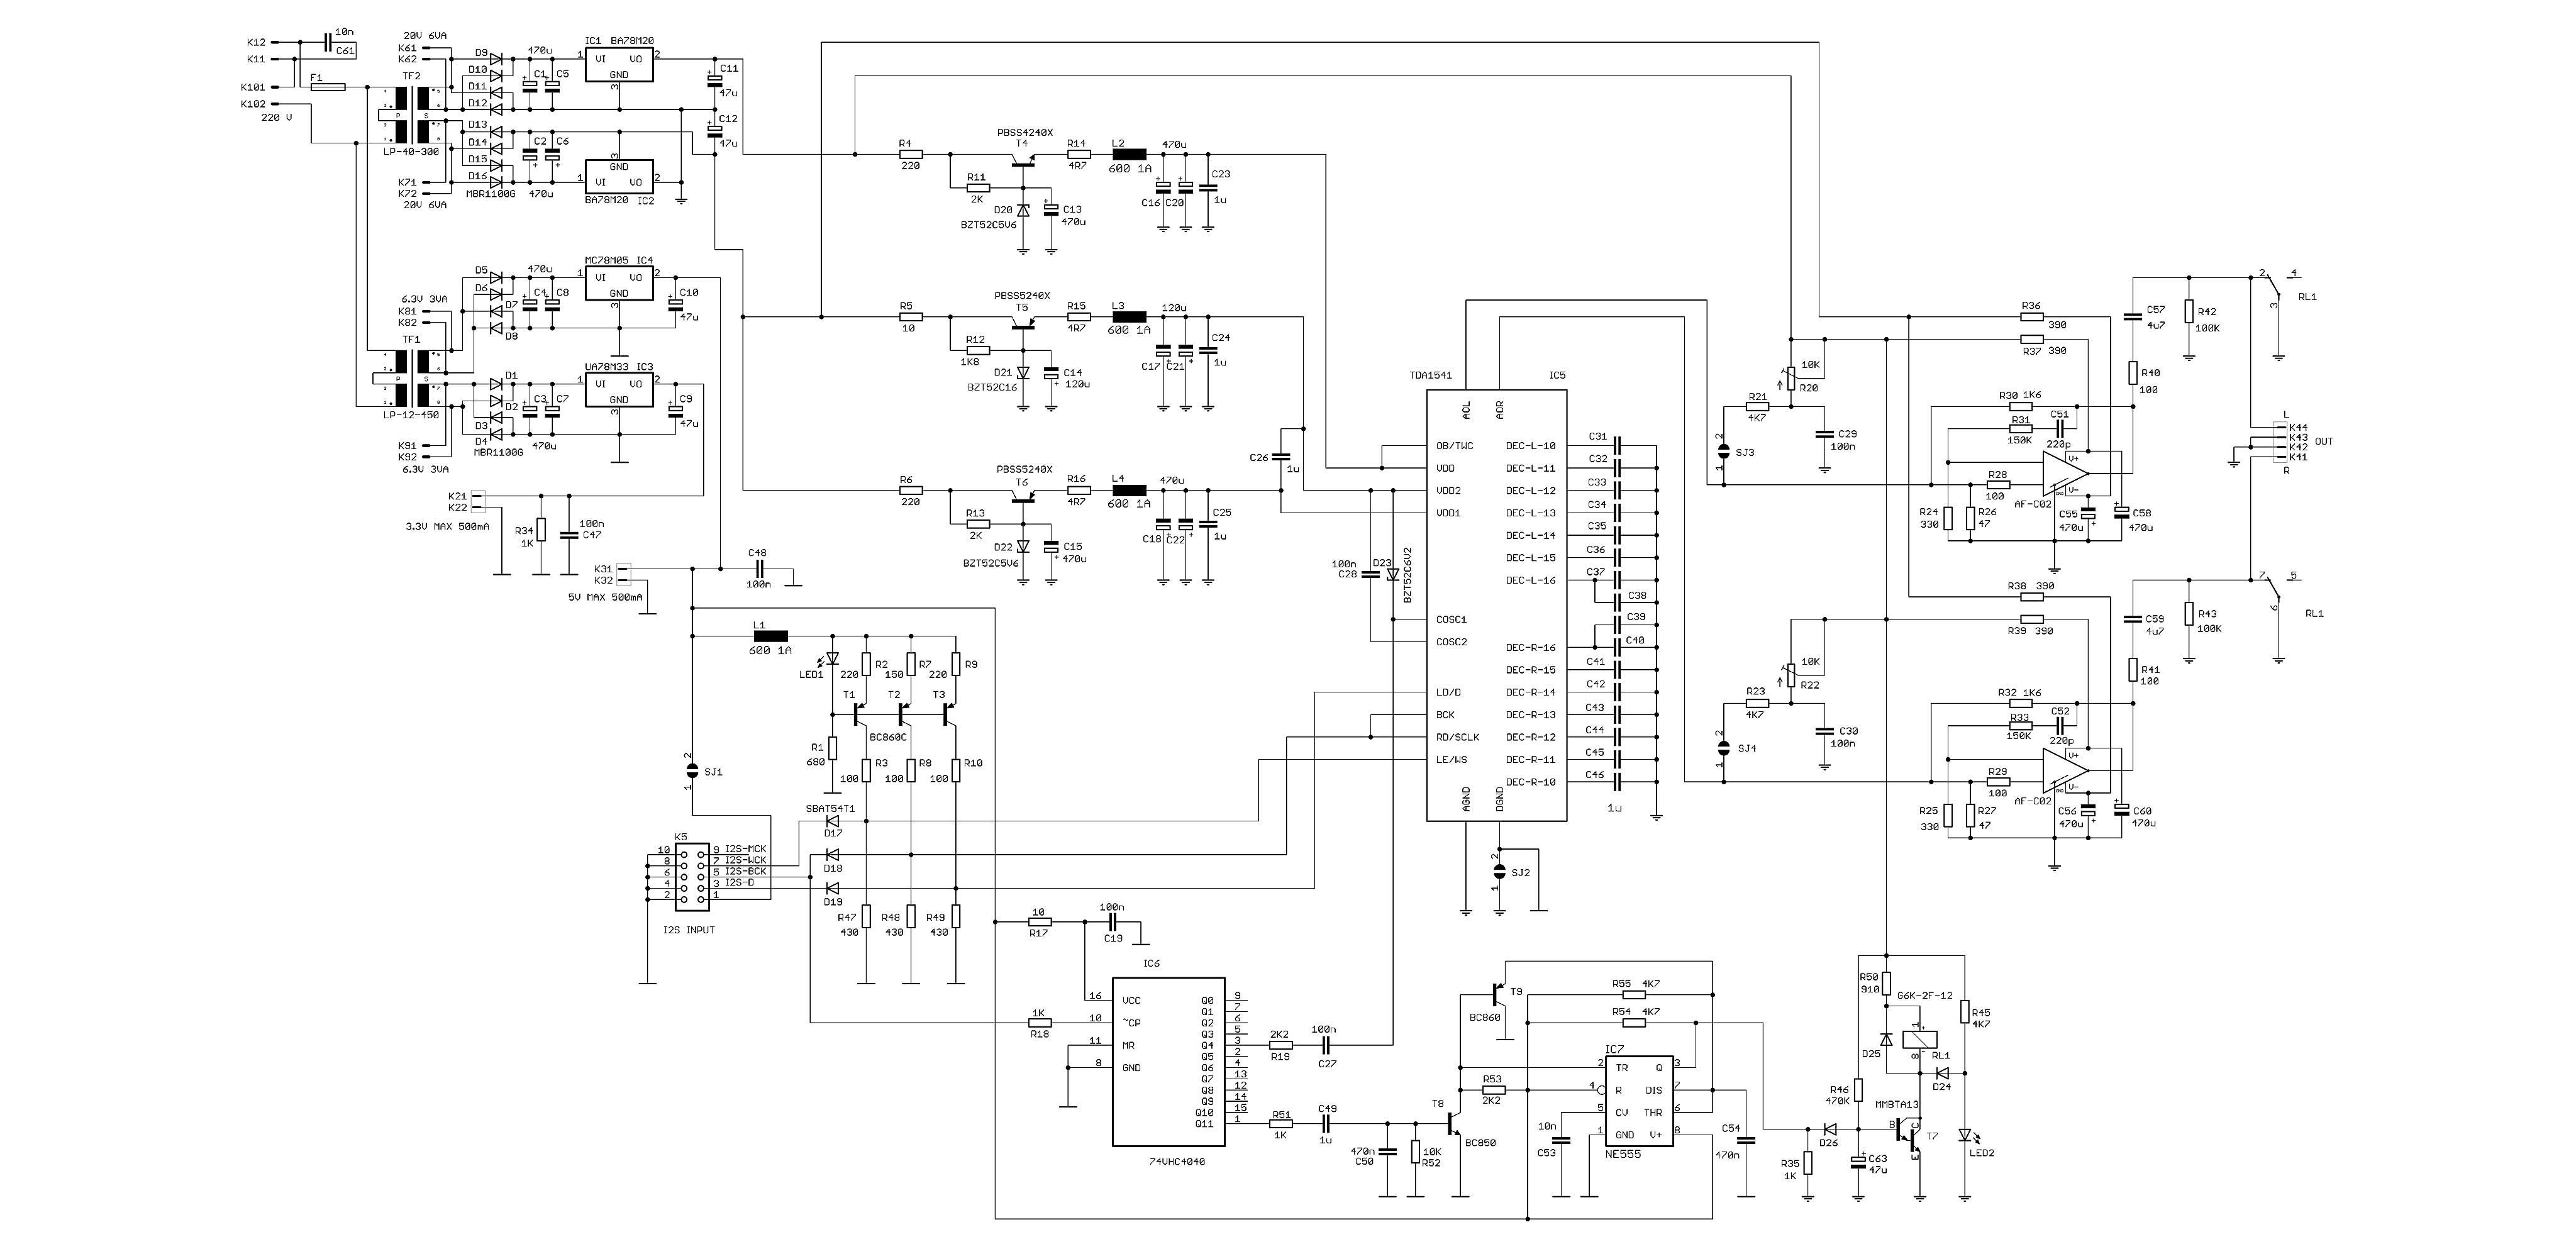 HDAC: schema elettrico 35164171956_c08dc70569_o_d